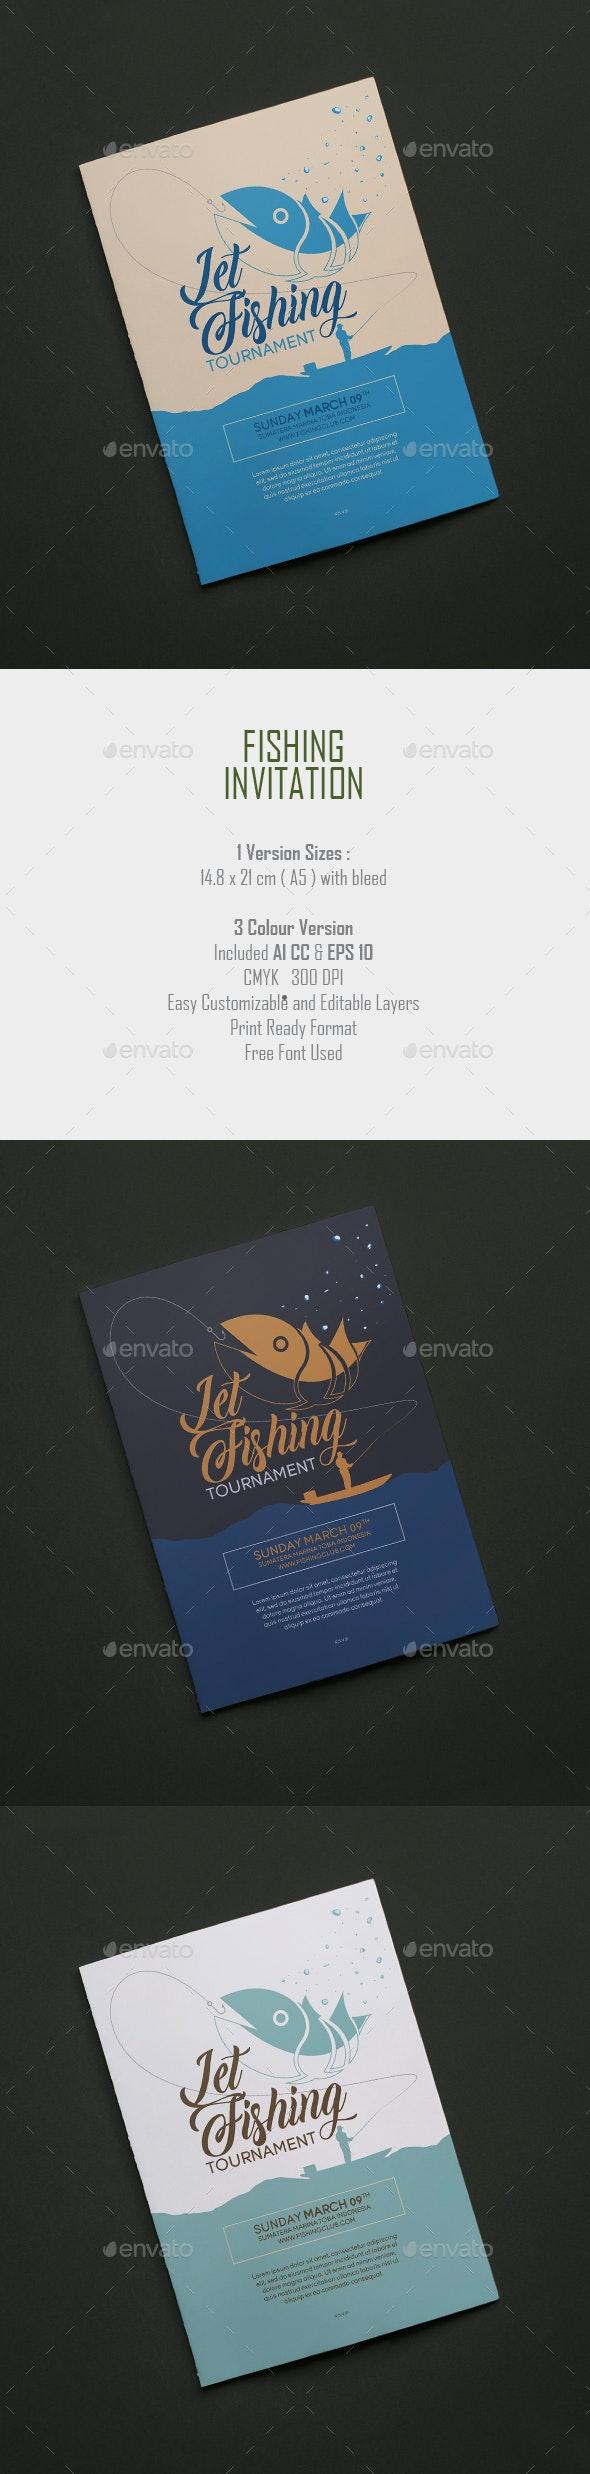 Fishing Invitation - Flyers Print Templates